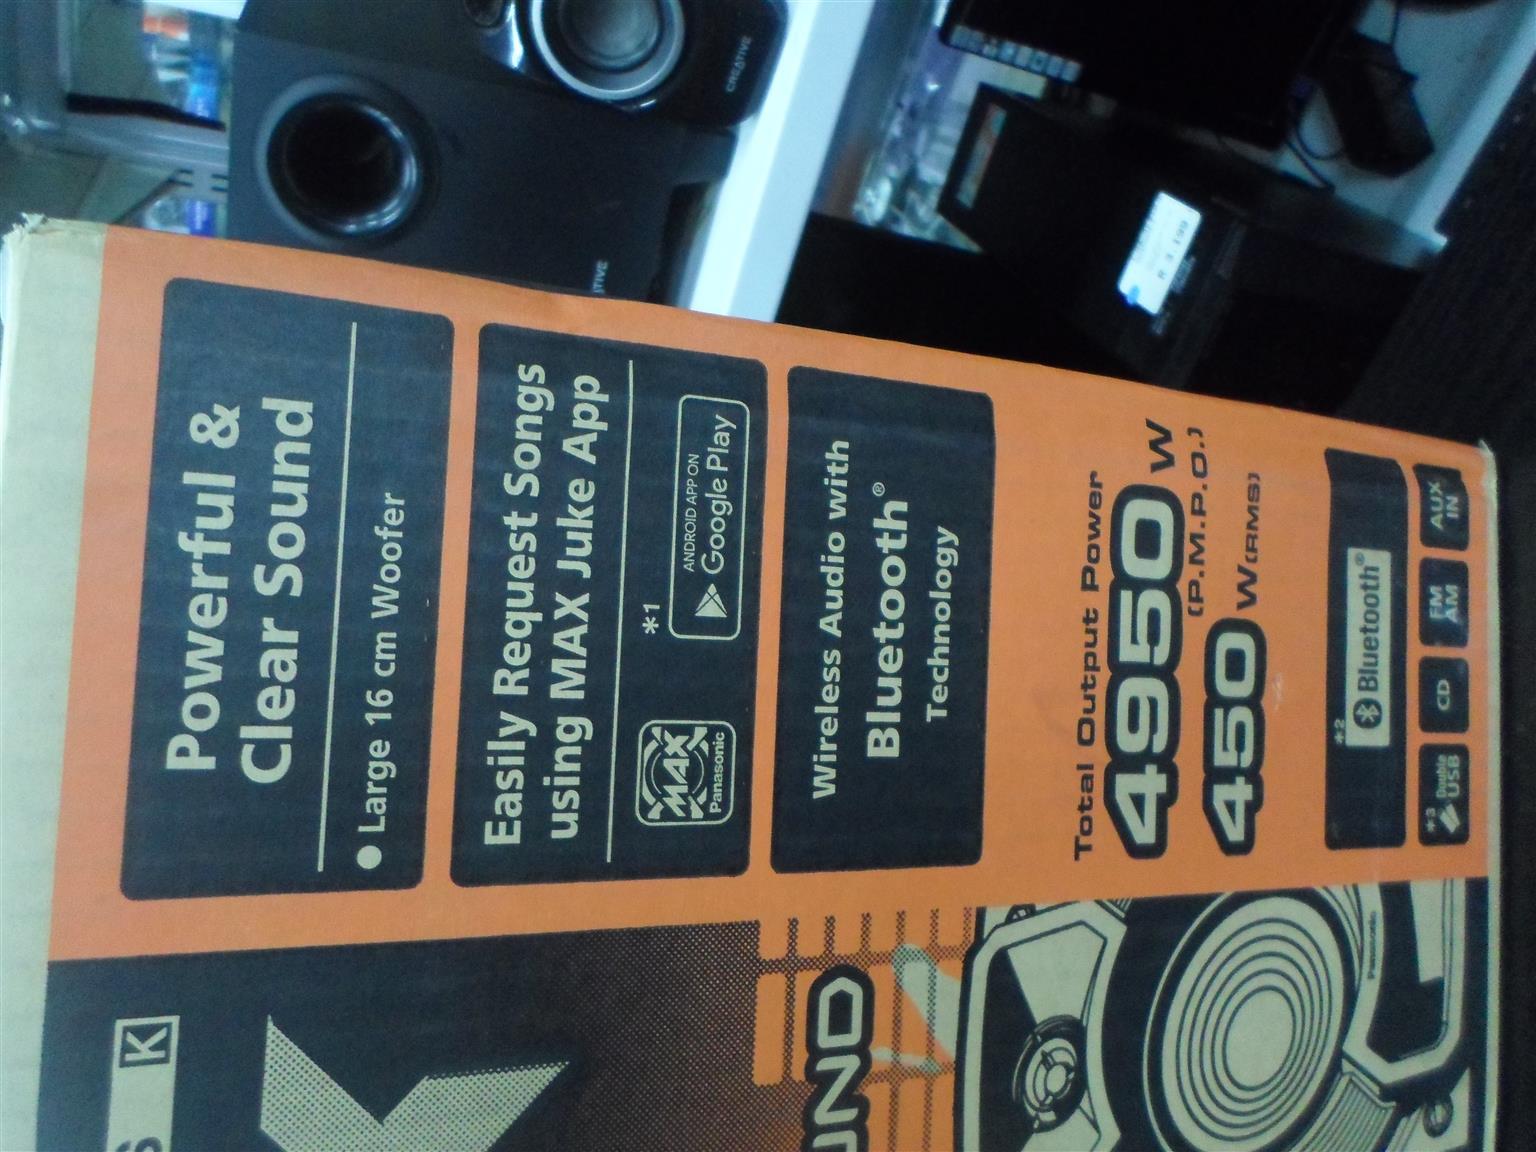 Panasonic SC-AKX220 CD Stereo System